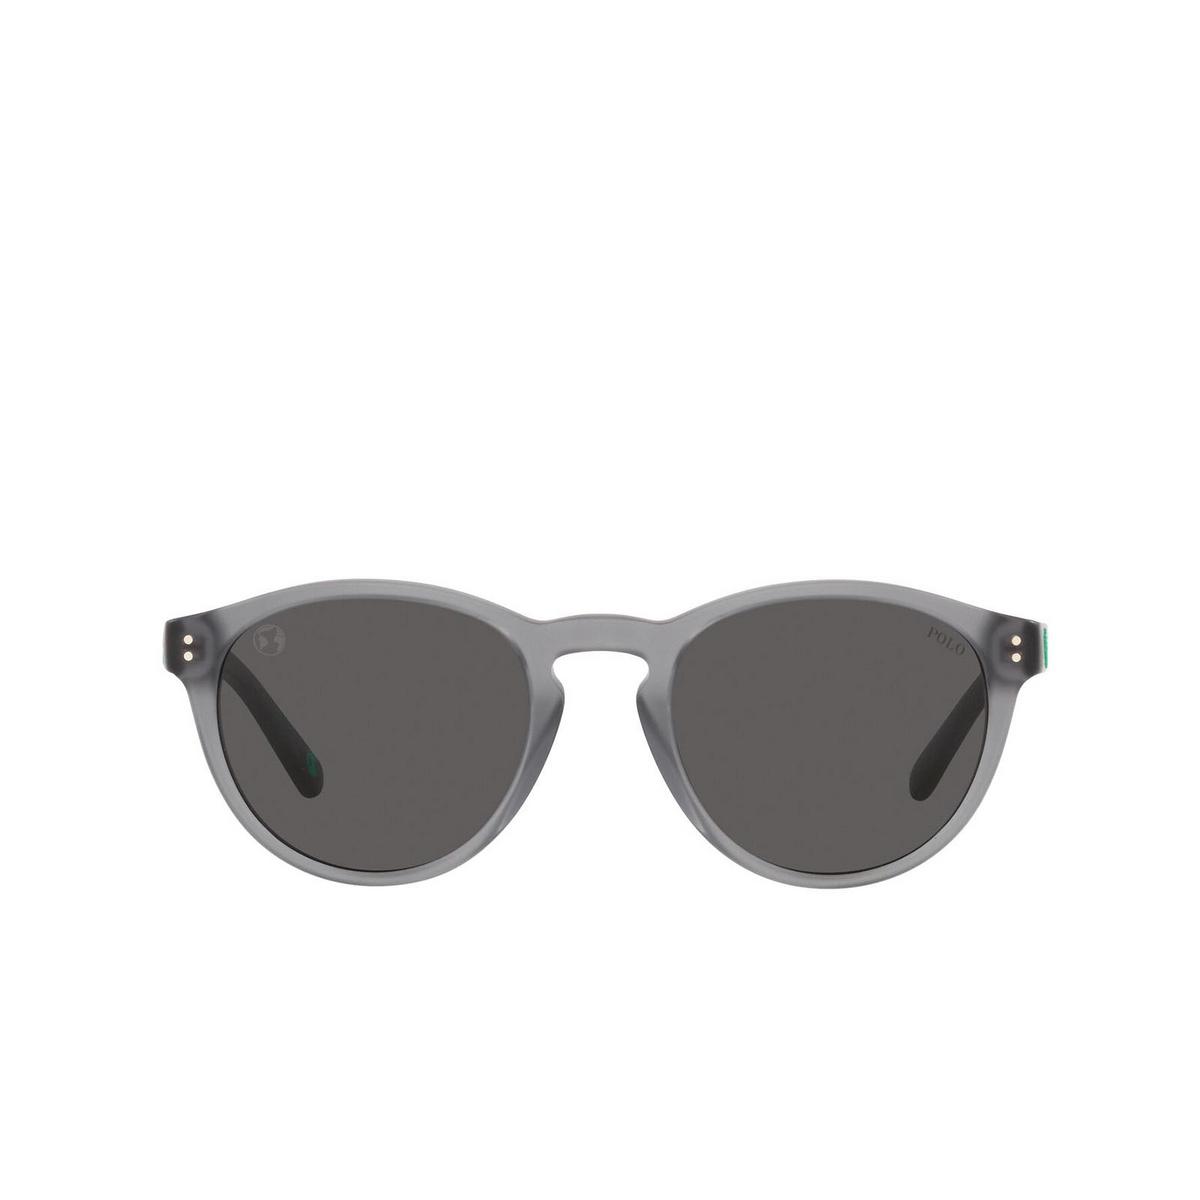 Polo Ralph Lauren® Round Sunglasses: PH4172 color Matte Transparent Dark Grey 595387.